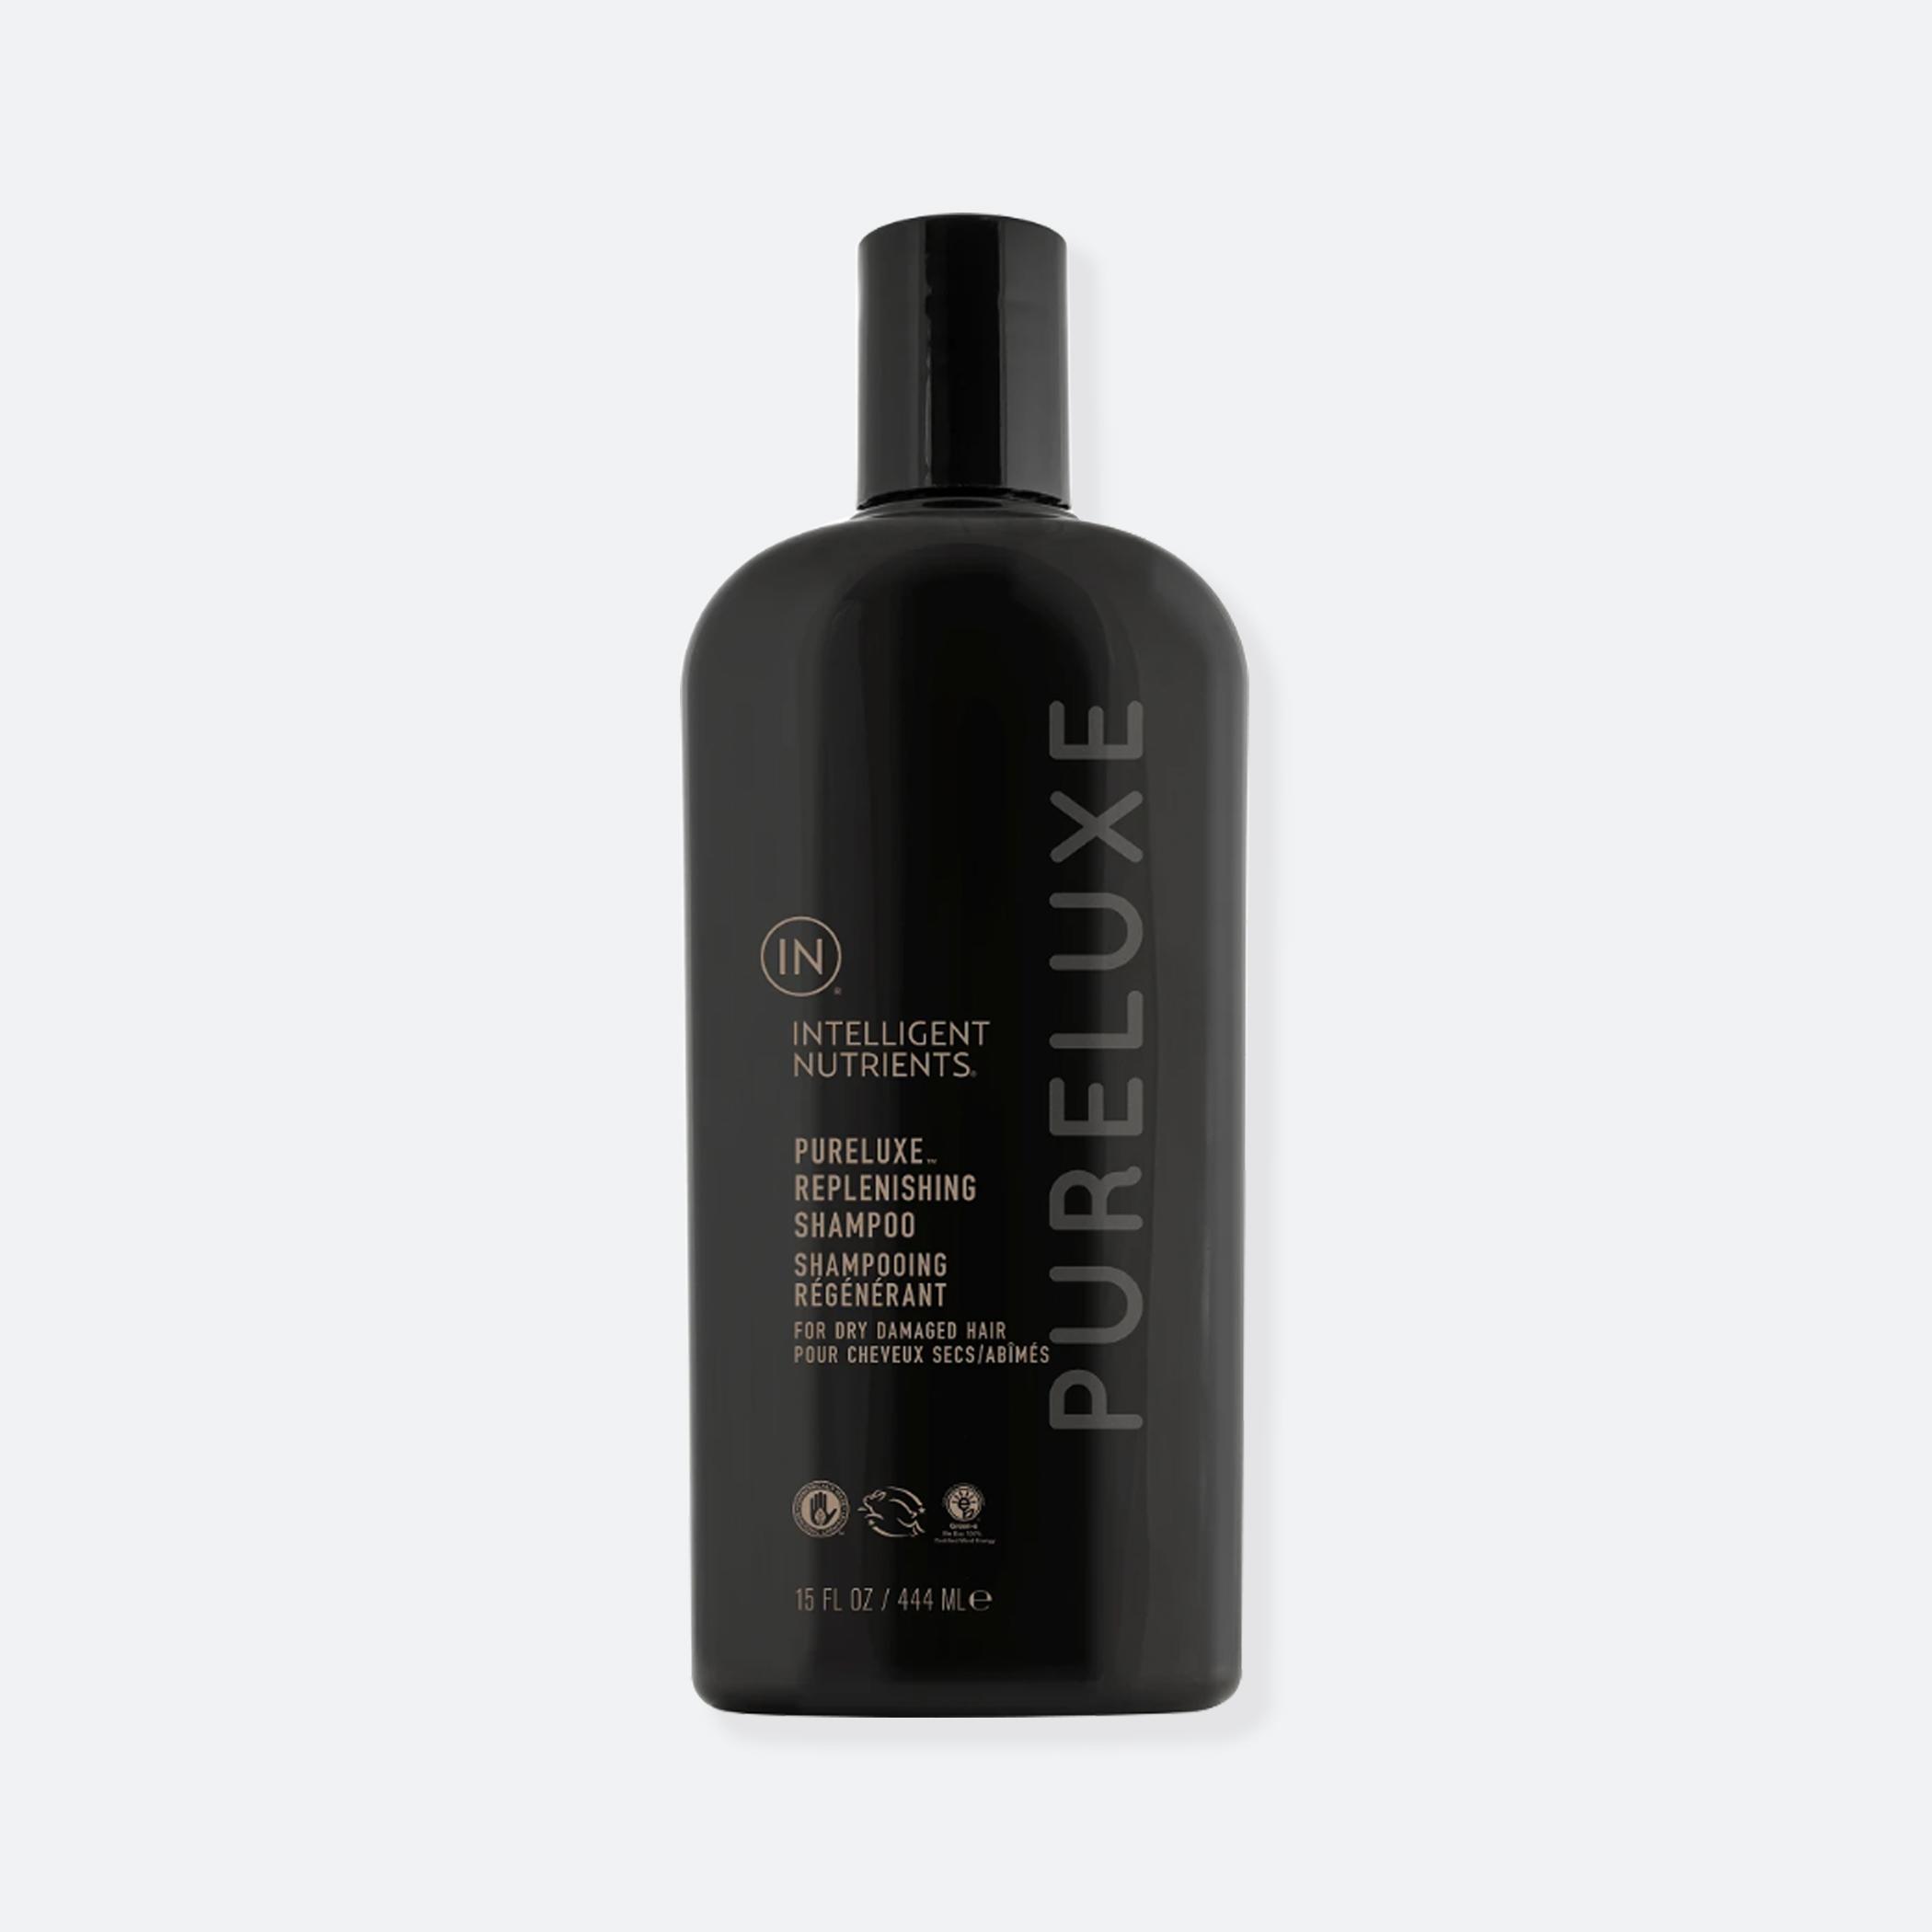 OhMart Intelligent Nutrients Pureluxe Replenishing Shampoo 1